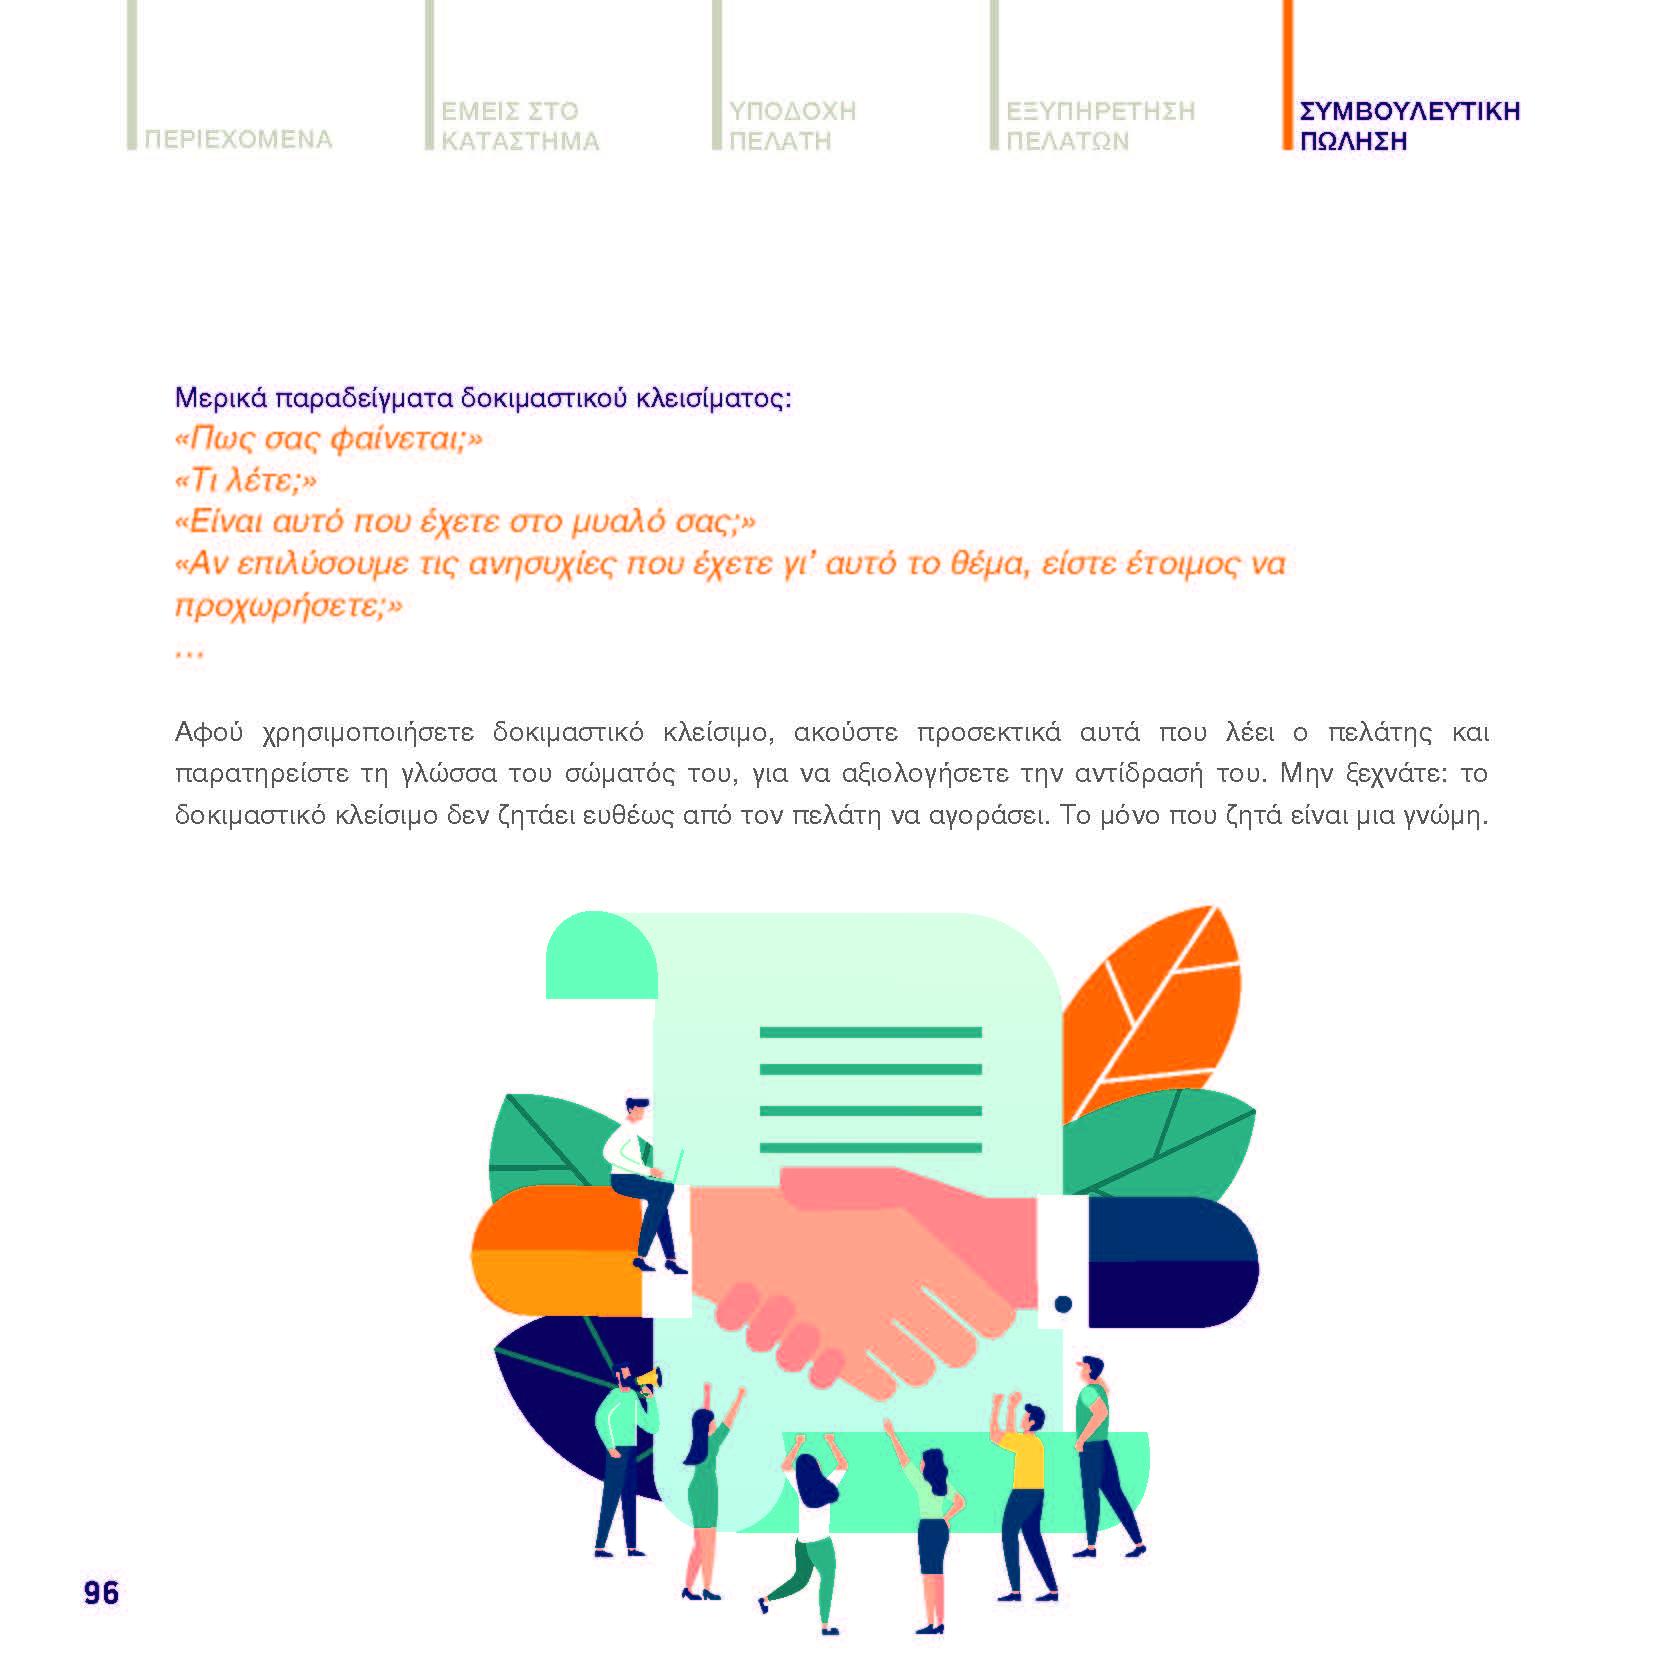 https://www.jib.gr/wp-content/uploads/2020/09/OPTIMA-BANK-BOOKLET-WEB_Page_096.jpg